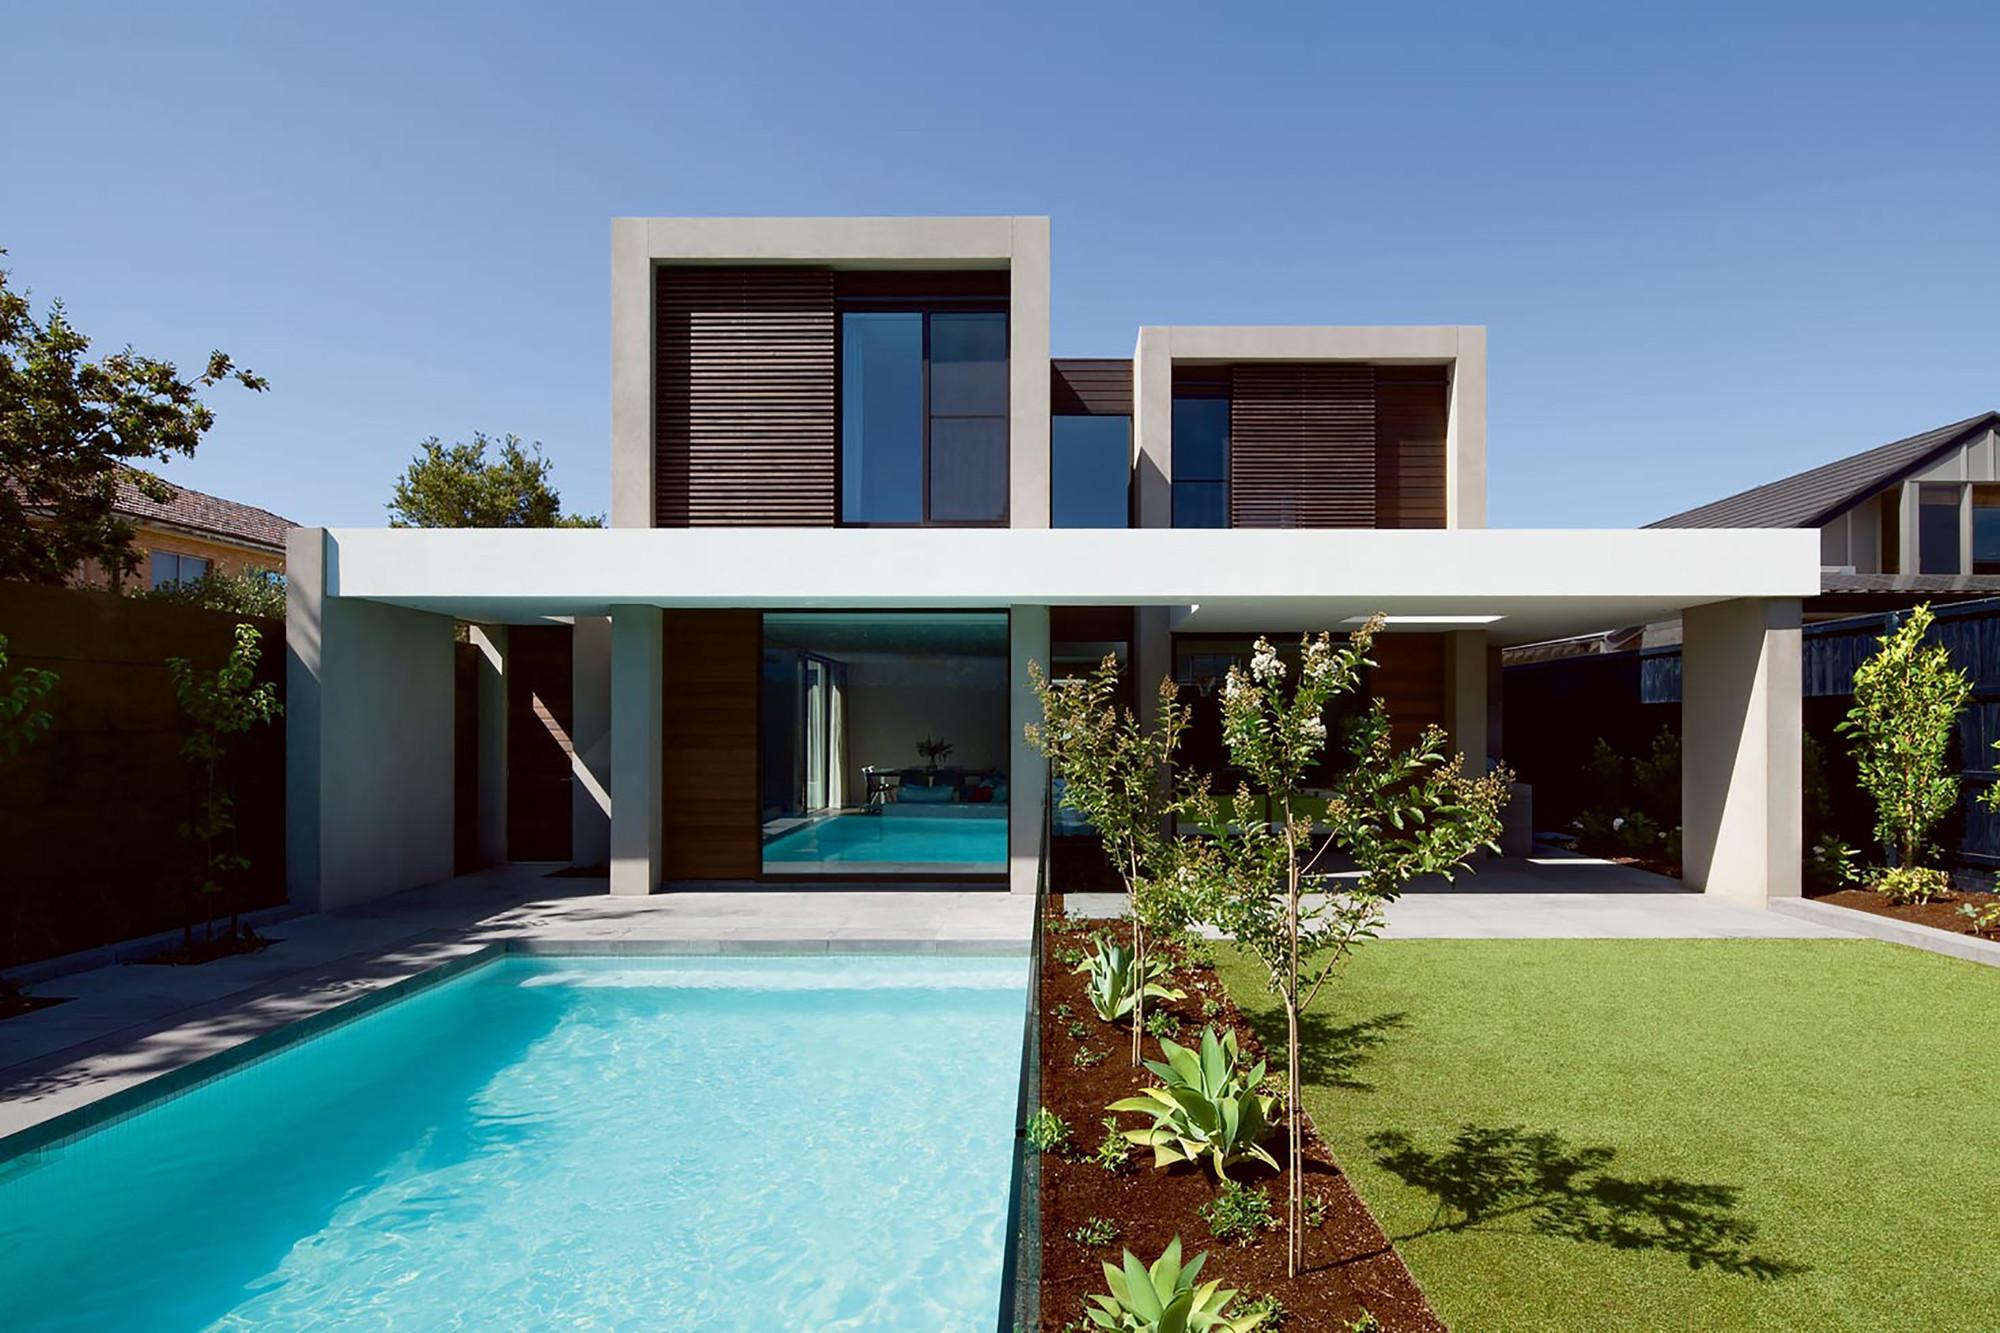 Brighton house by Inform Design.